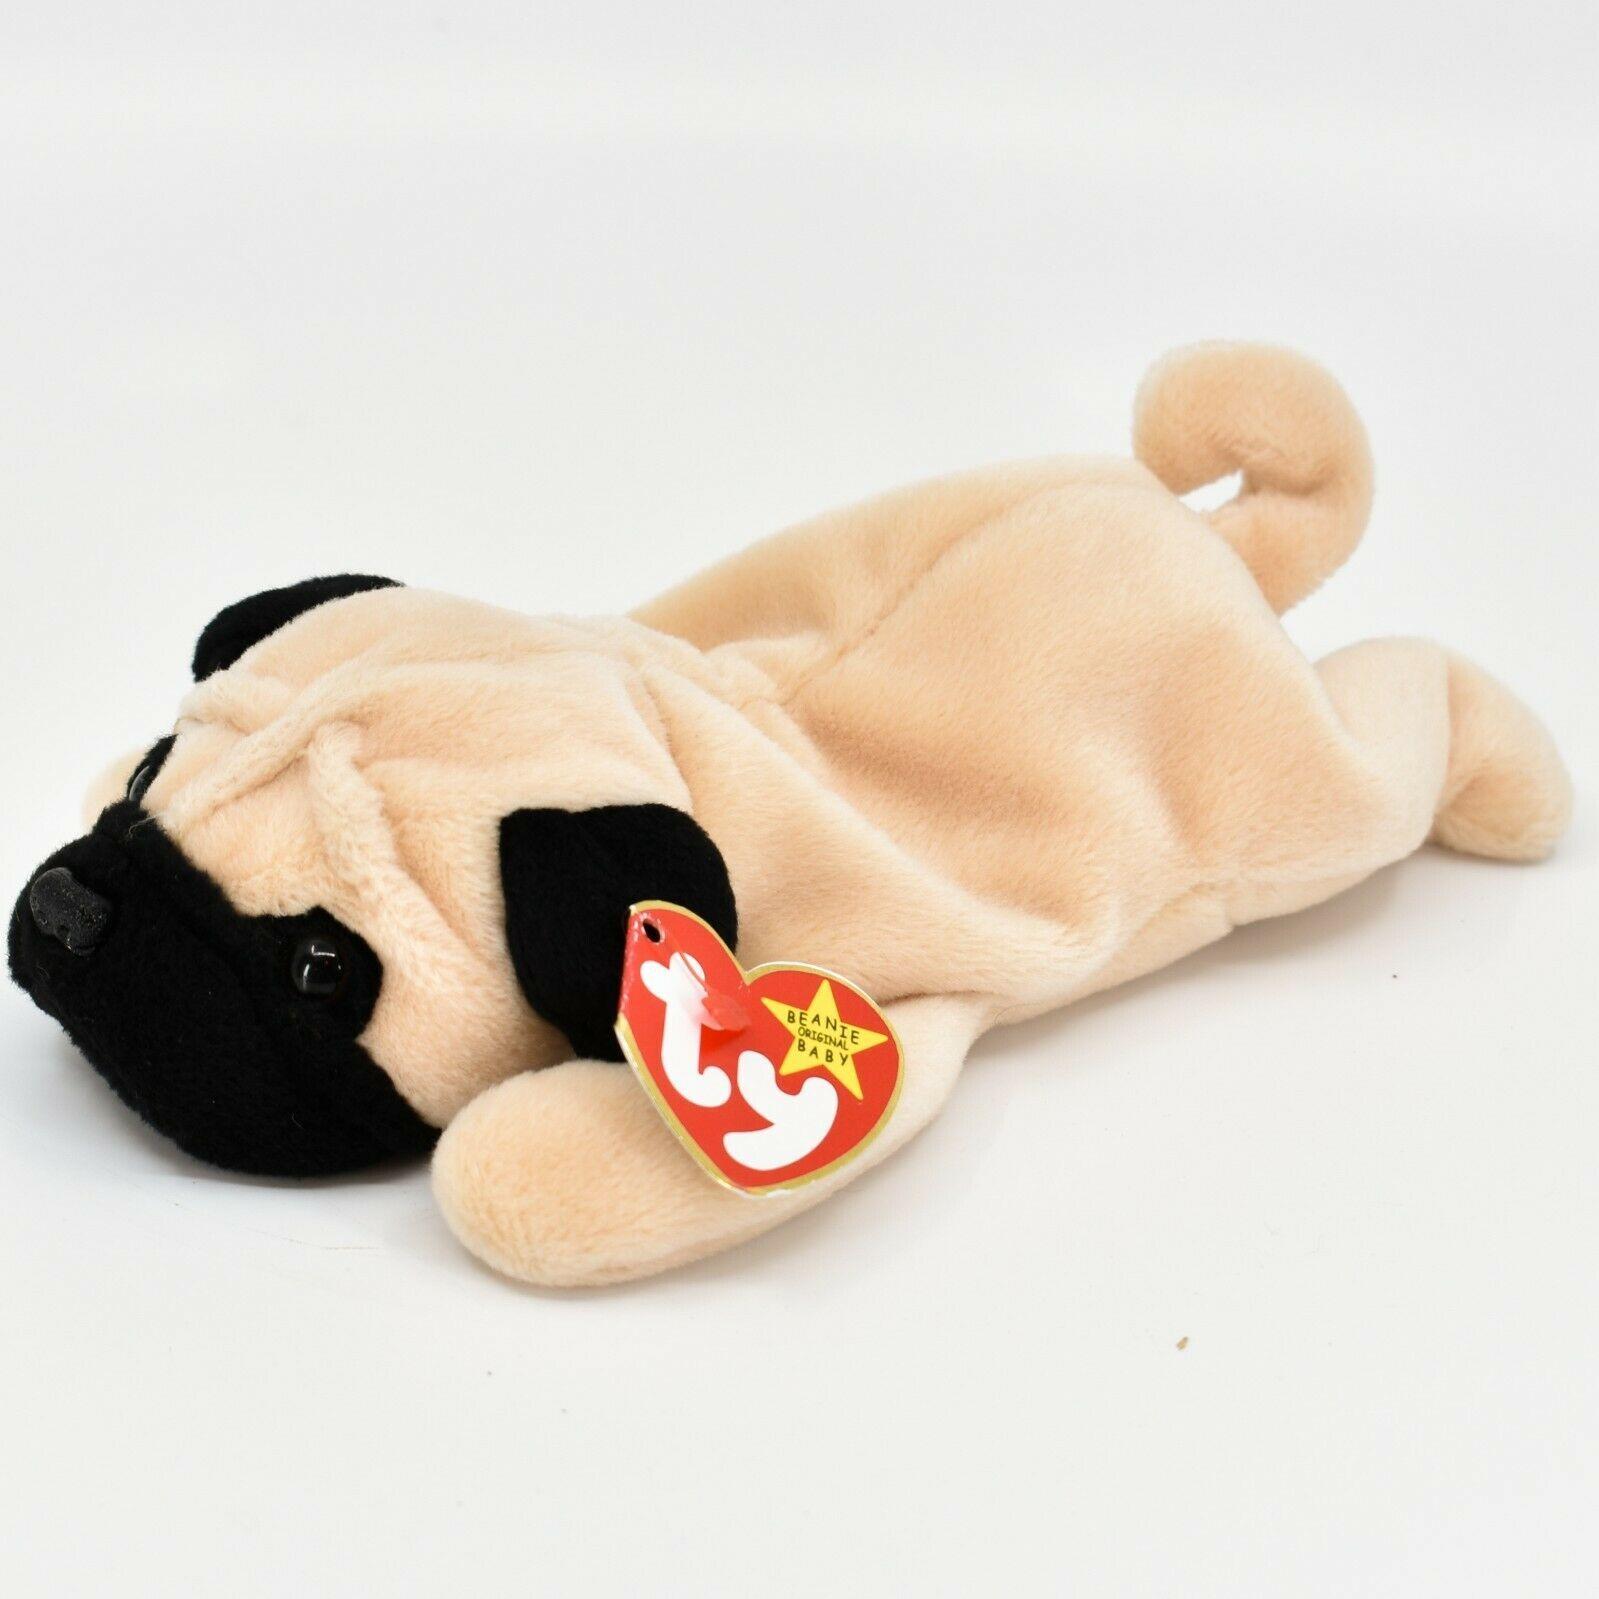 1996 TY Beanie Baby Original Pugsly the Pug Dog Retired Beanbag Plush Toy